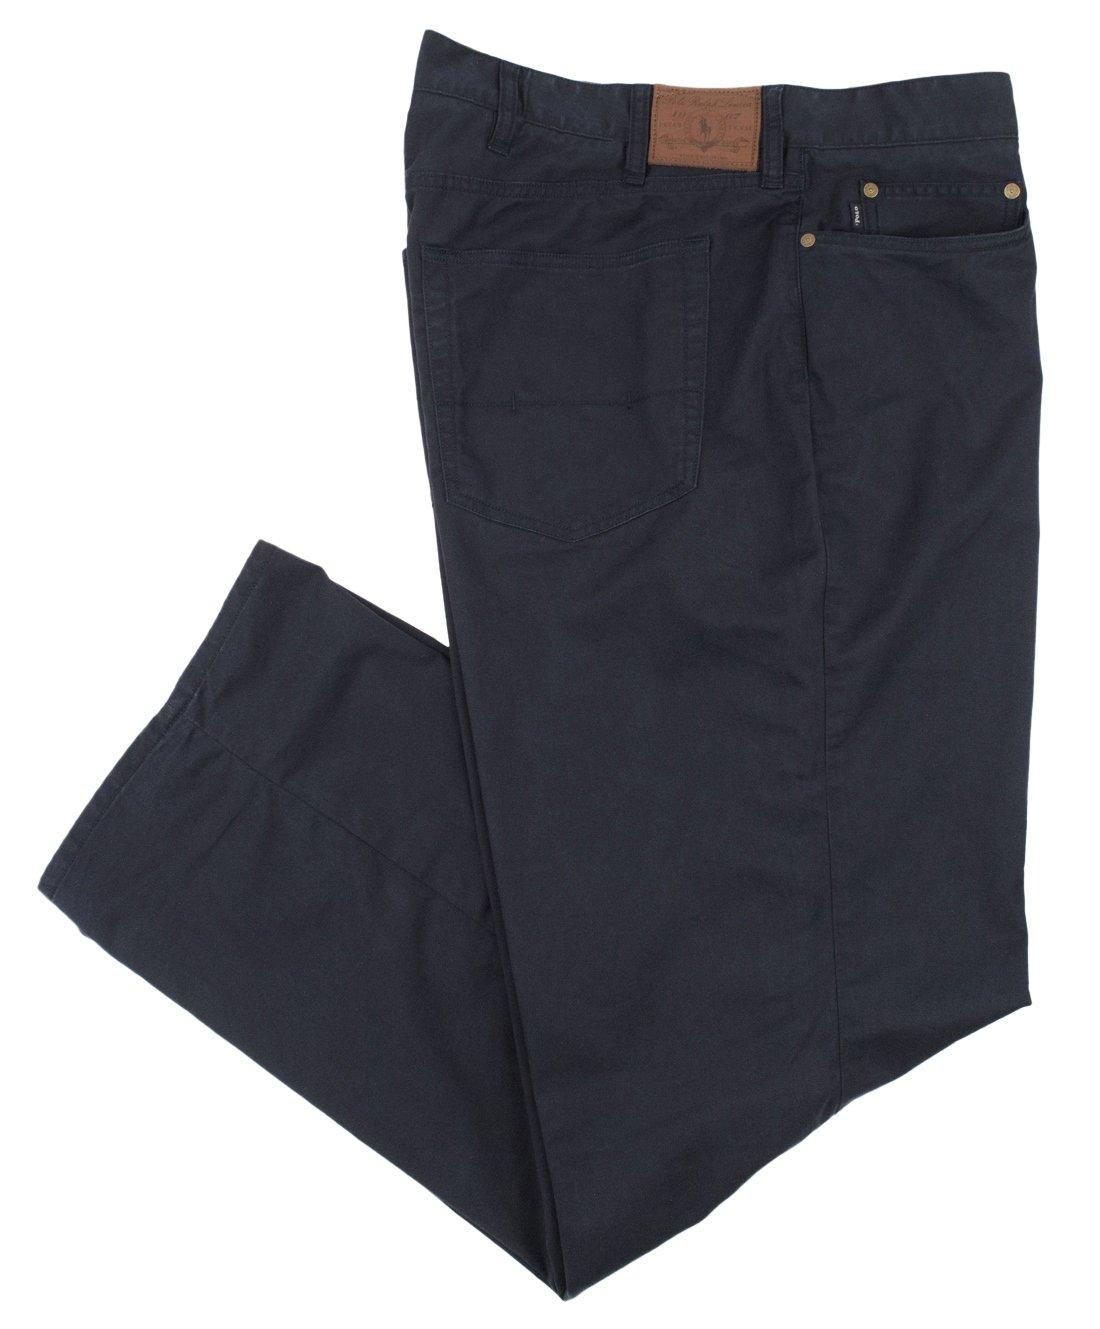 Polo Ralph Lauren Men's Big & Tall Stretch Classic Fit Chino Pants-ANVY-46Bx34L